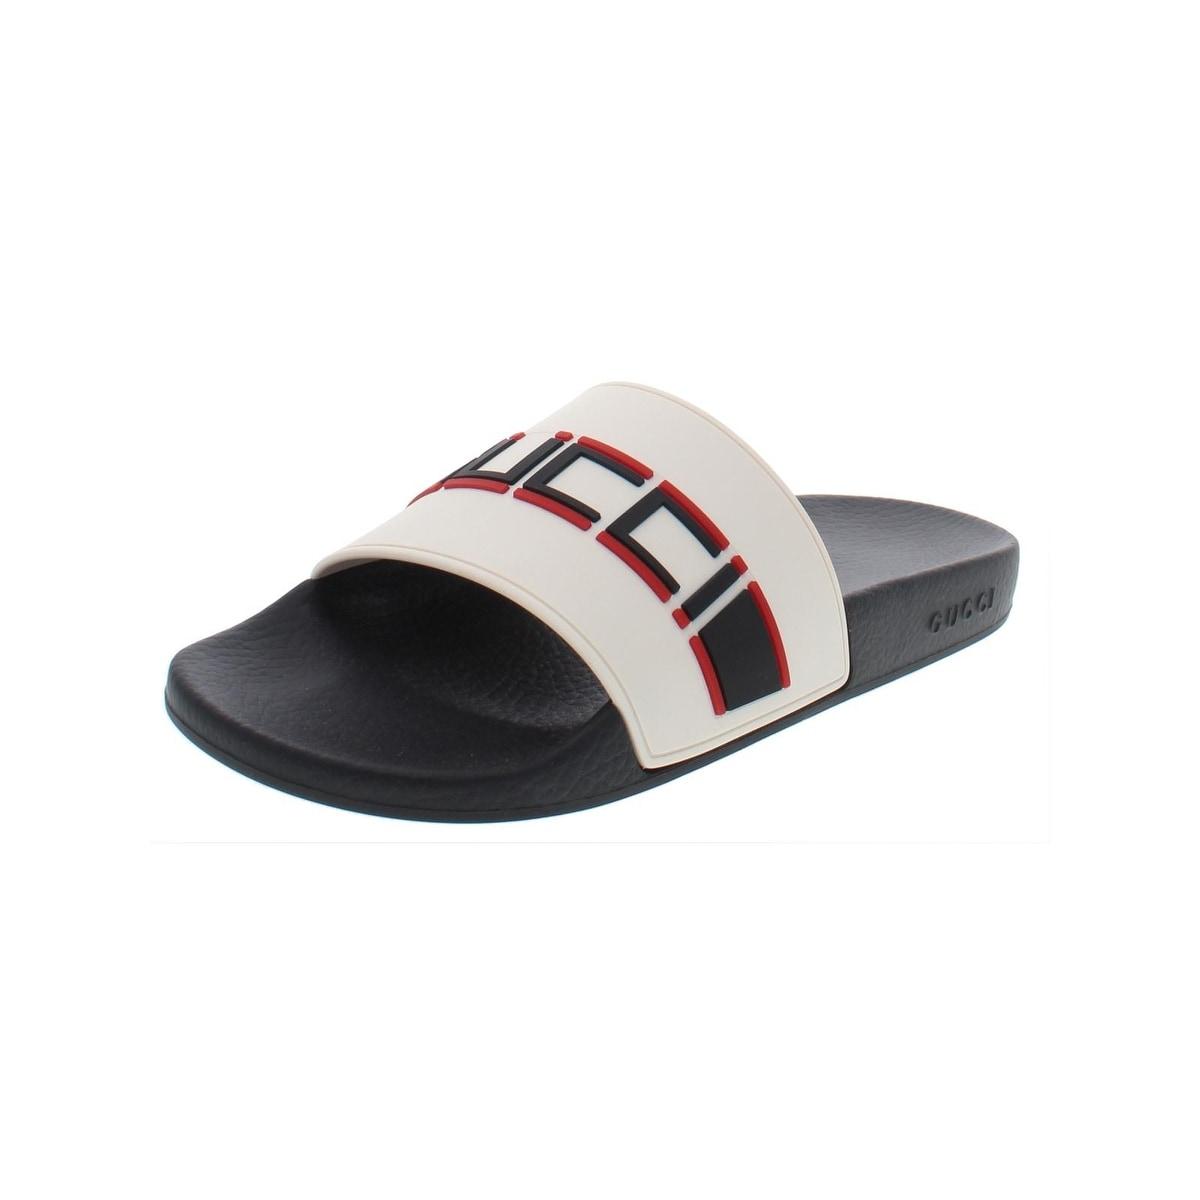 ba5a6eb54 Gucci Shoes